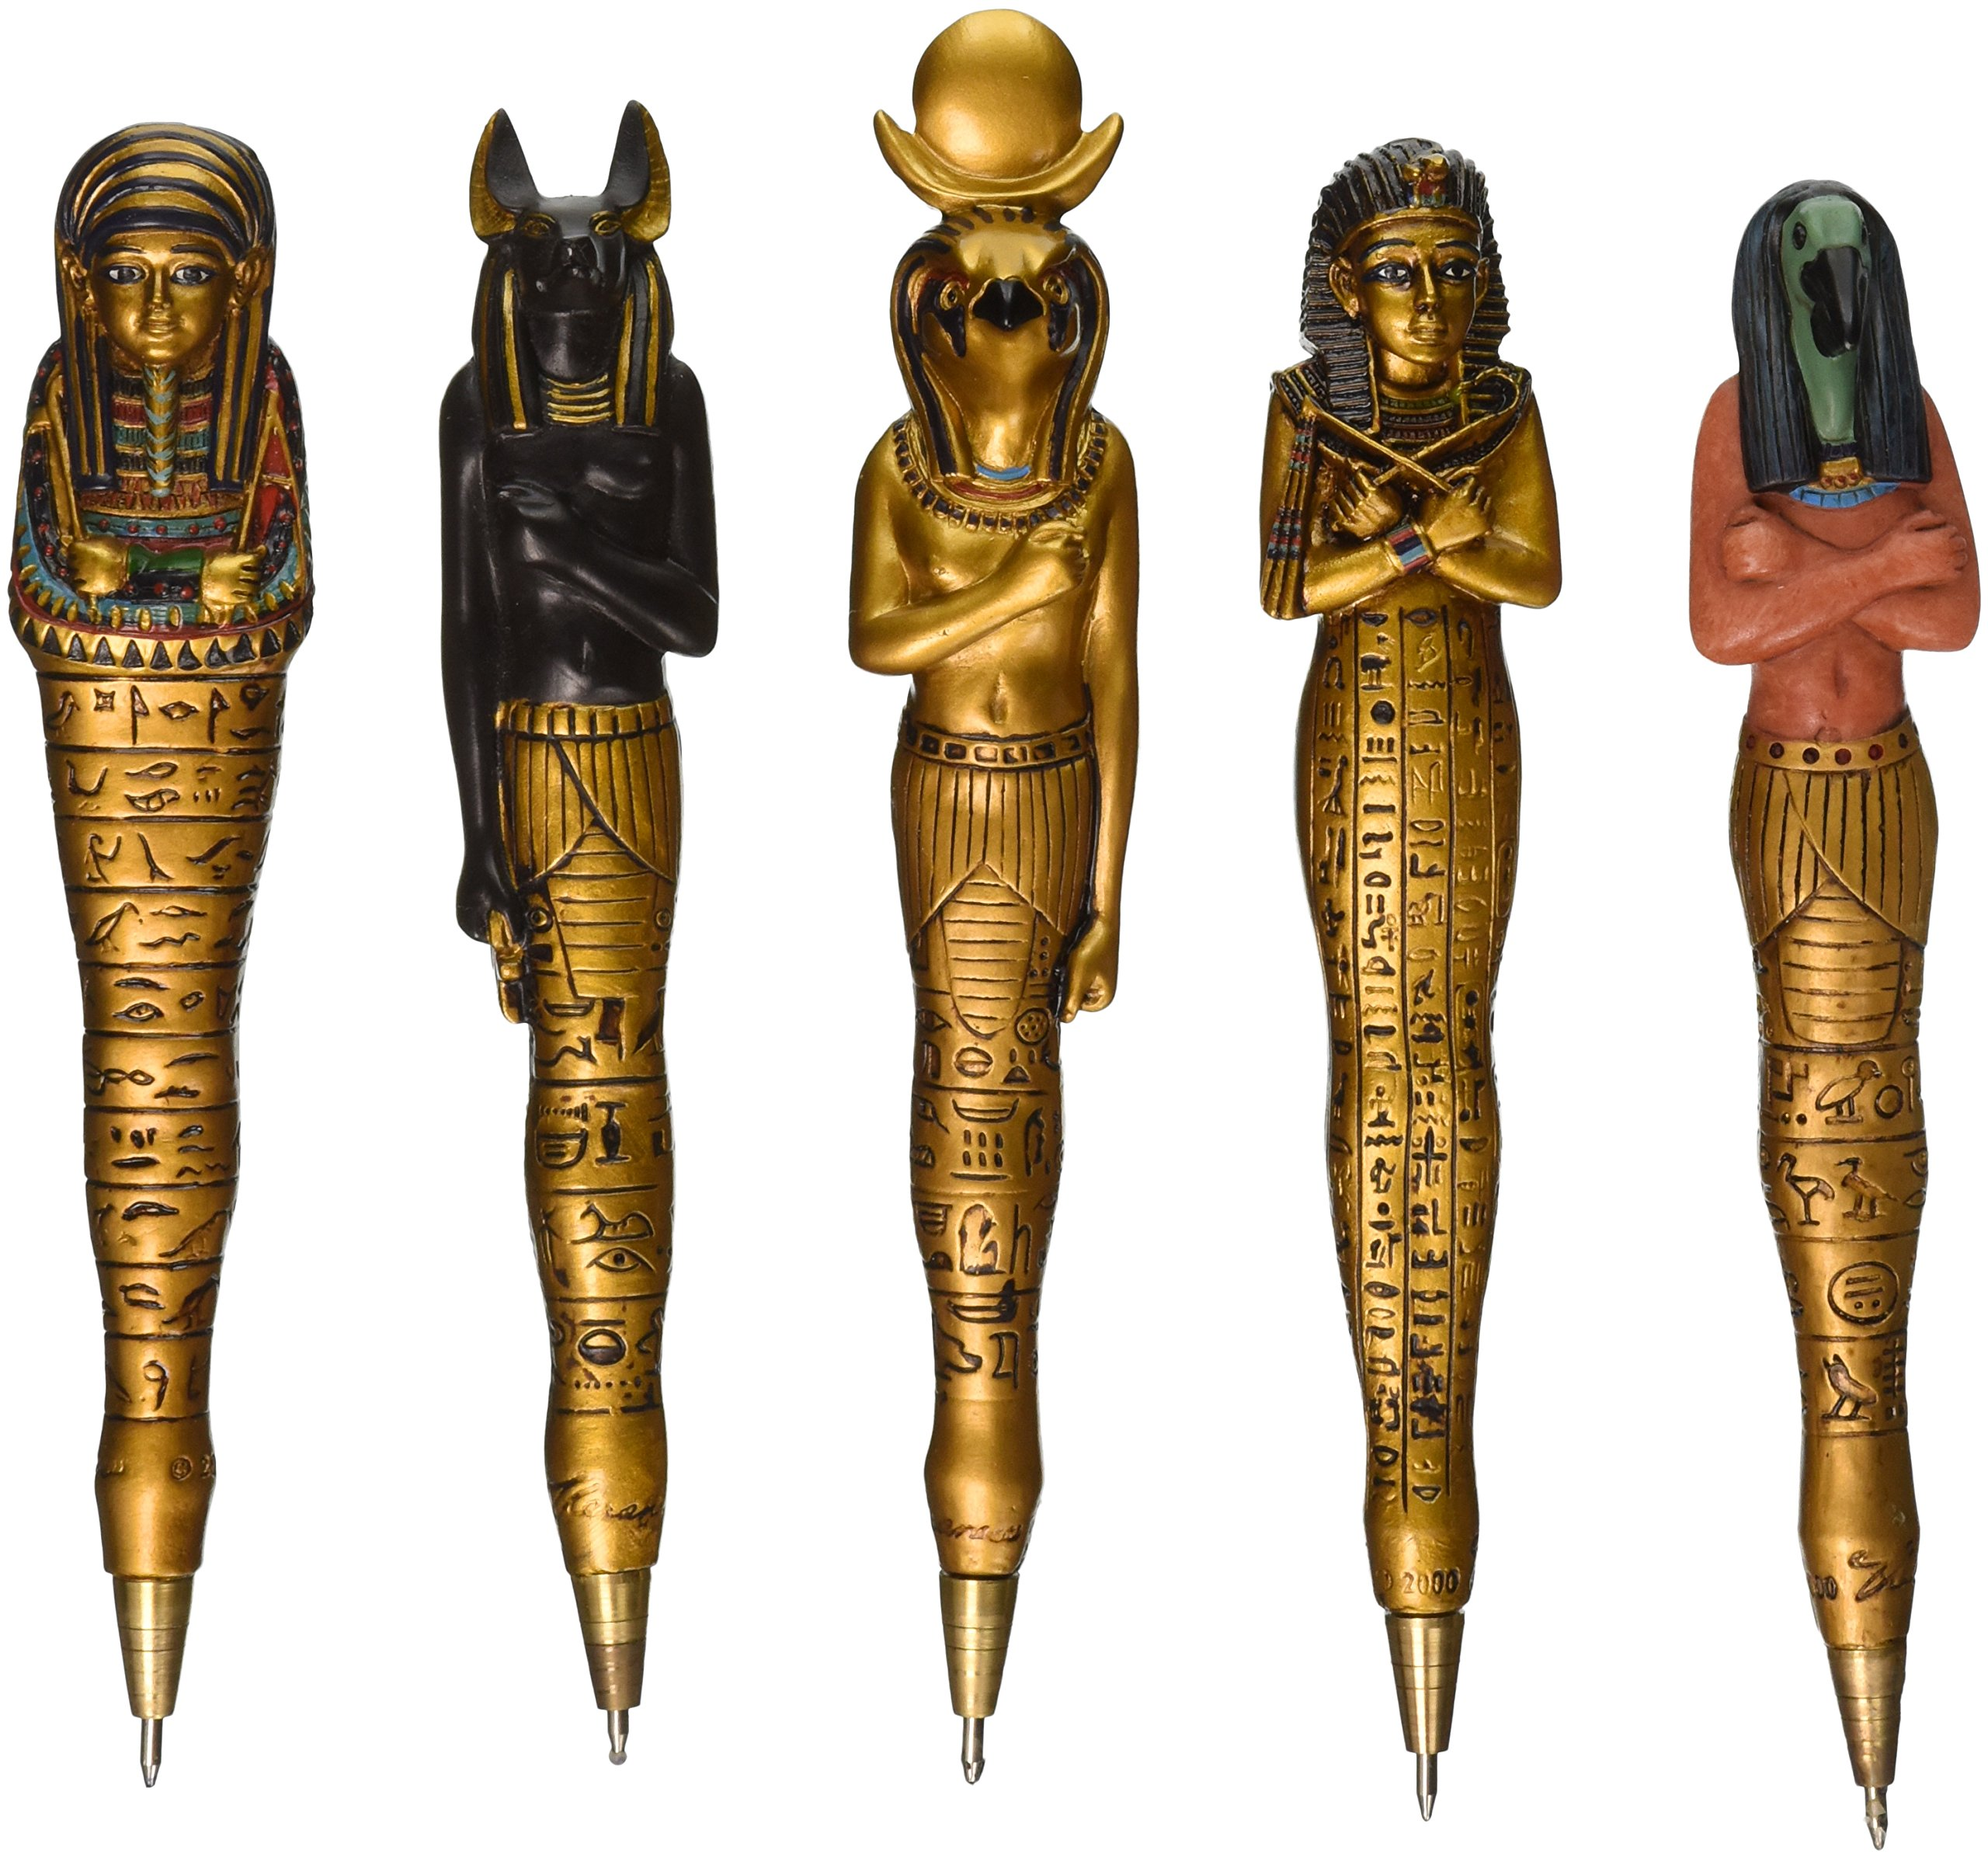 Egyptian Artifacts: Amazon.com